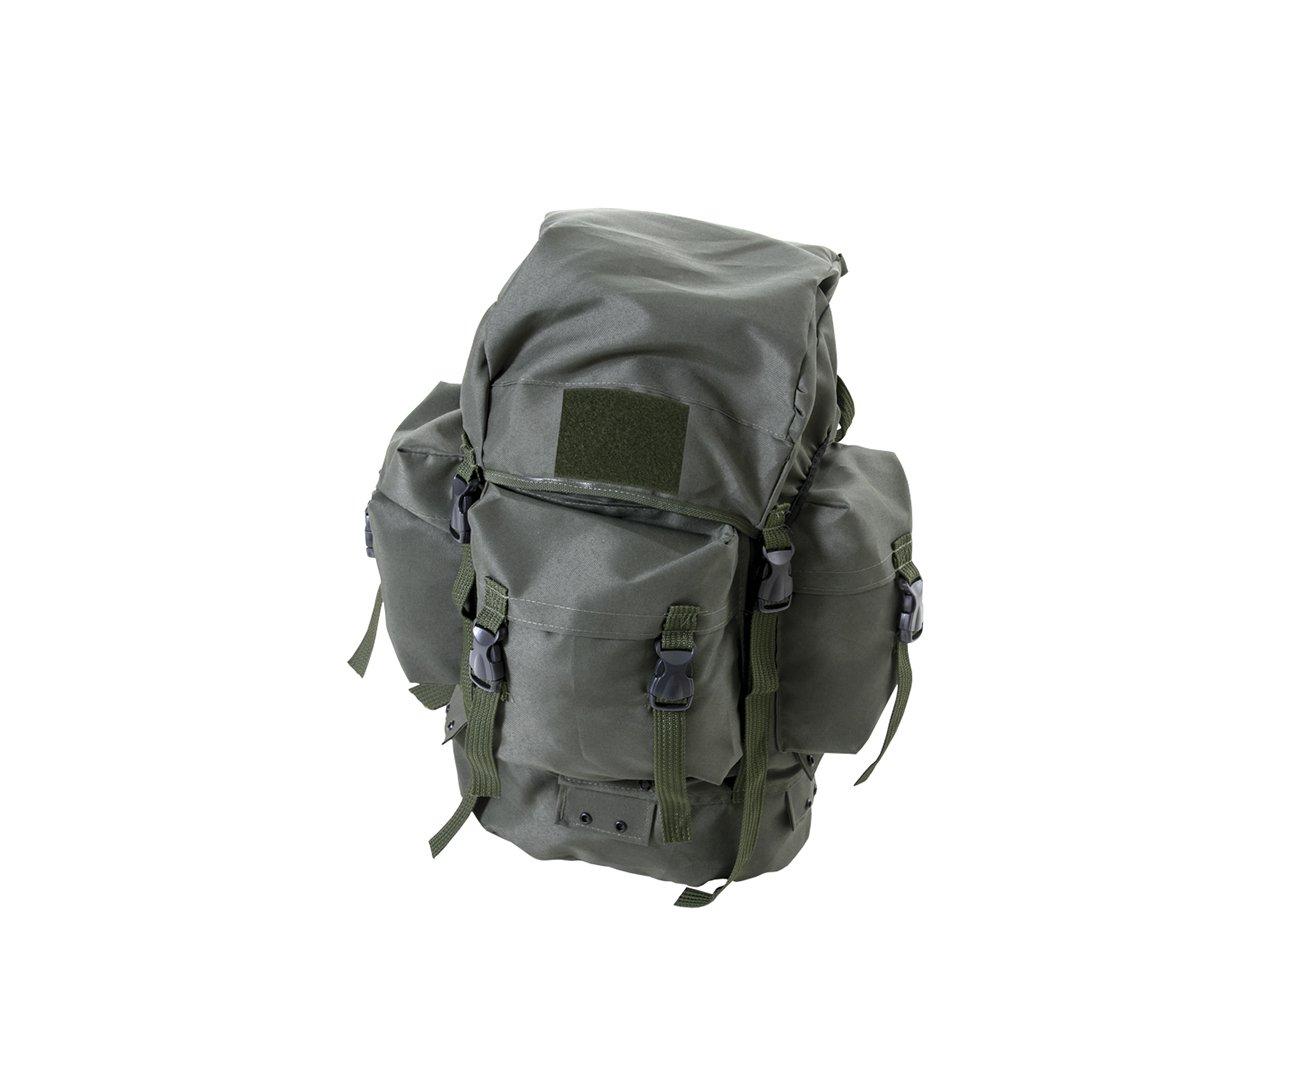 Mochila Pqd Grande  45 Lts Verde - Bravo